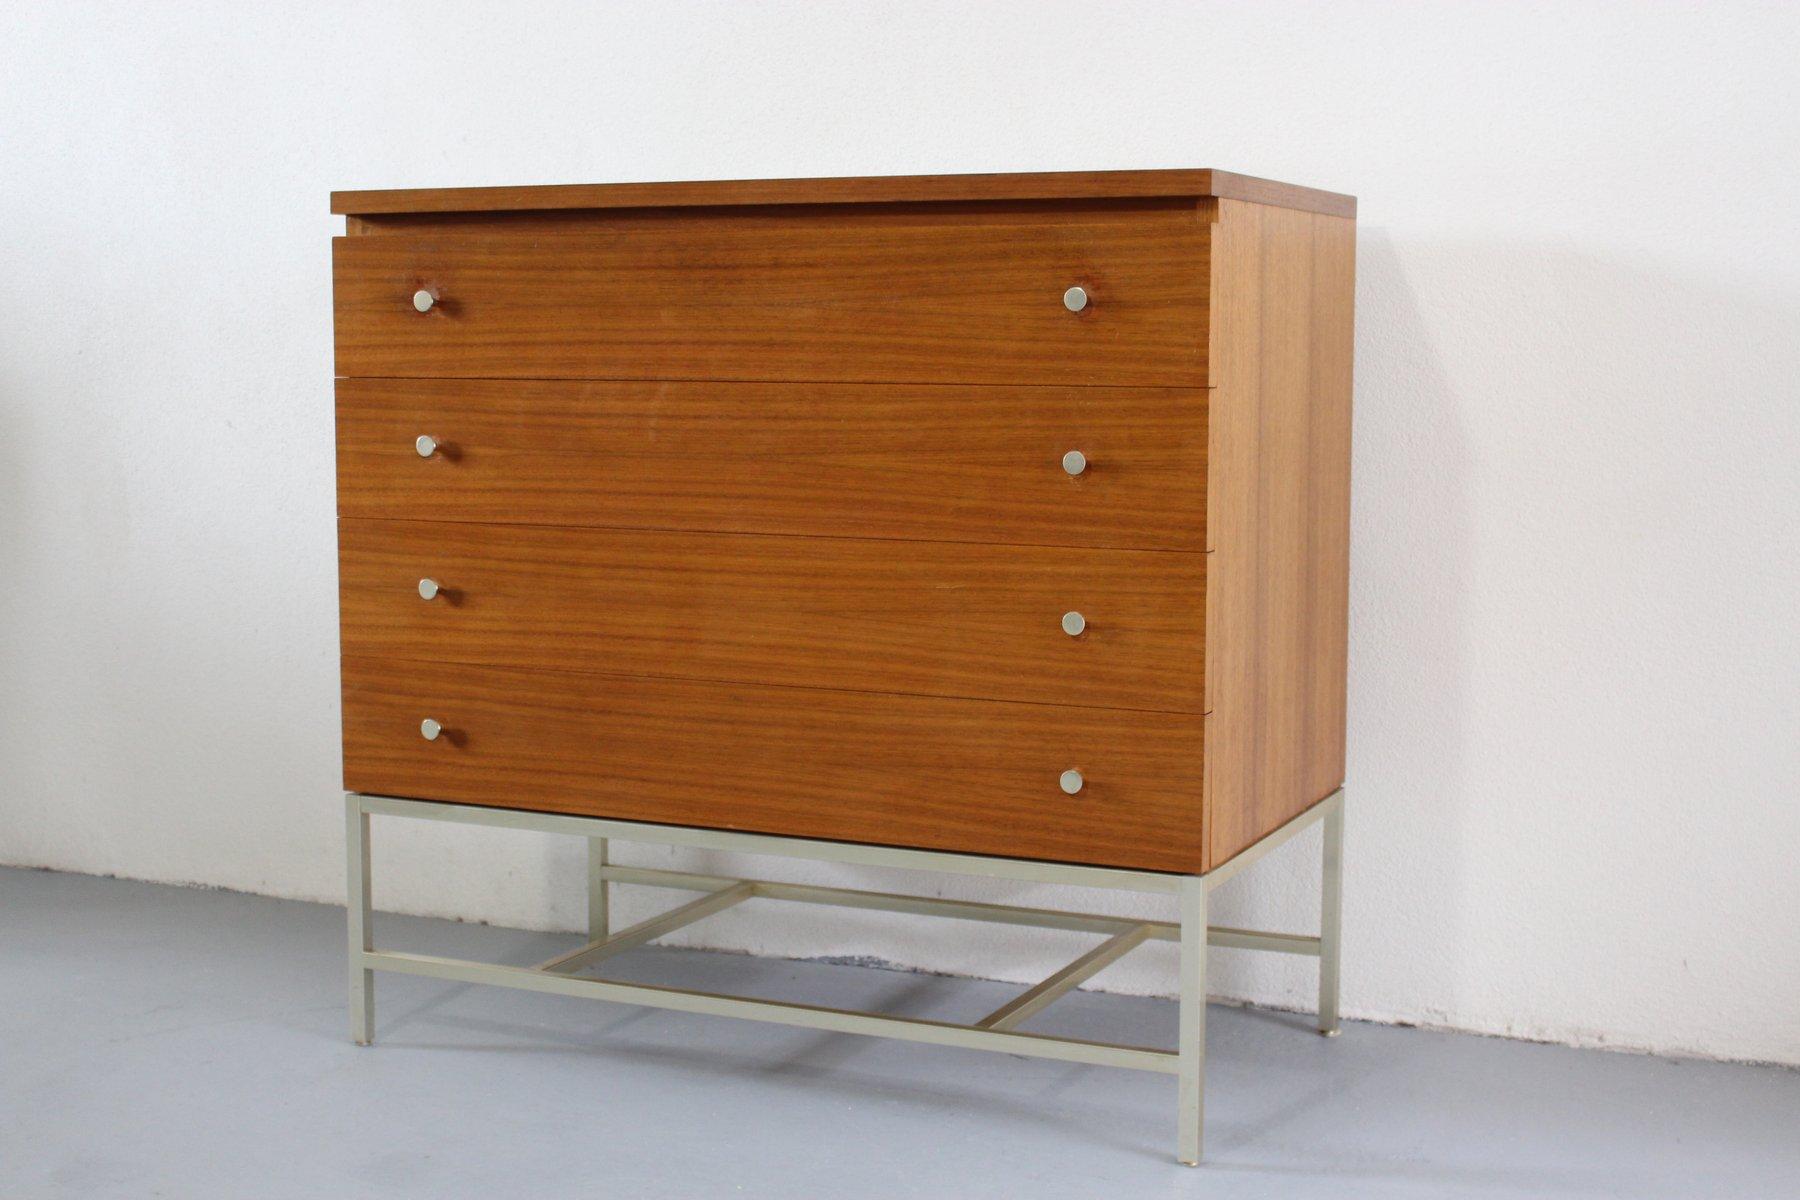 vintage nussholz kommode von paul mccobb f r wk m bel bei pamono kaufen. Black Bedroom Furniture Sets. Home Design Ideas